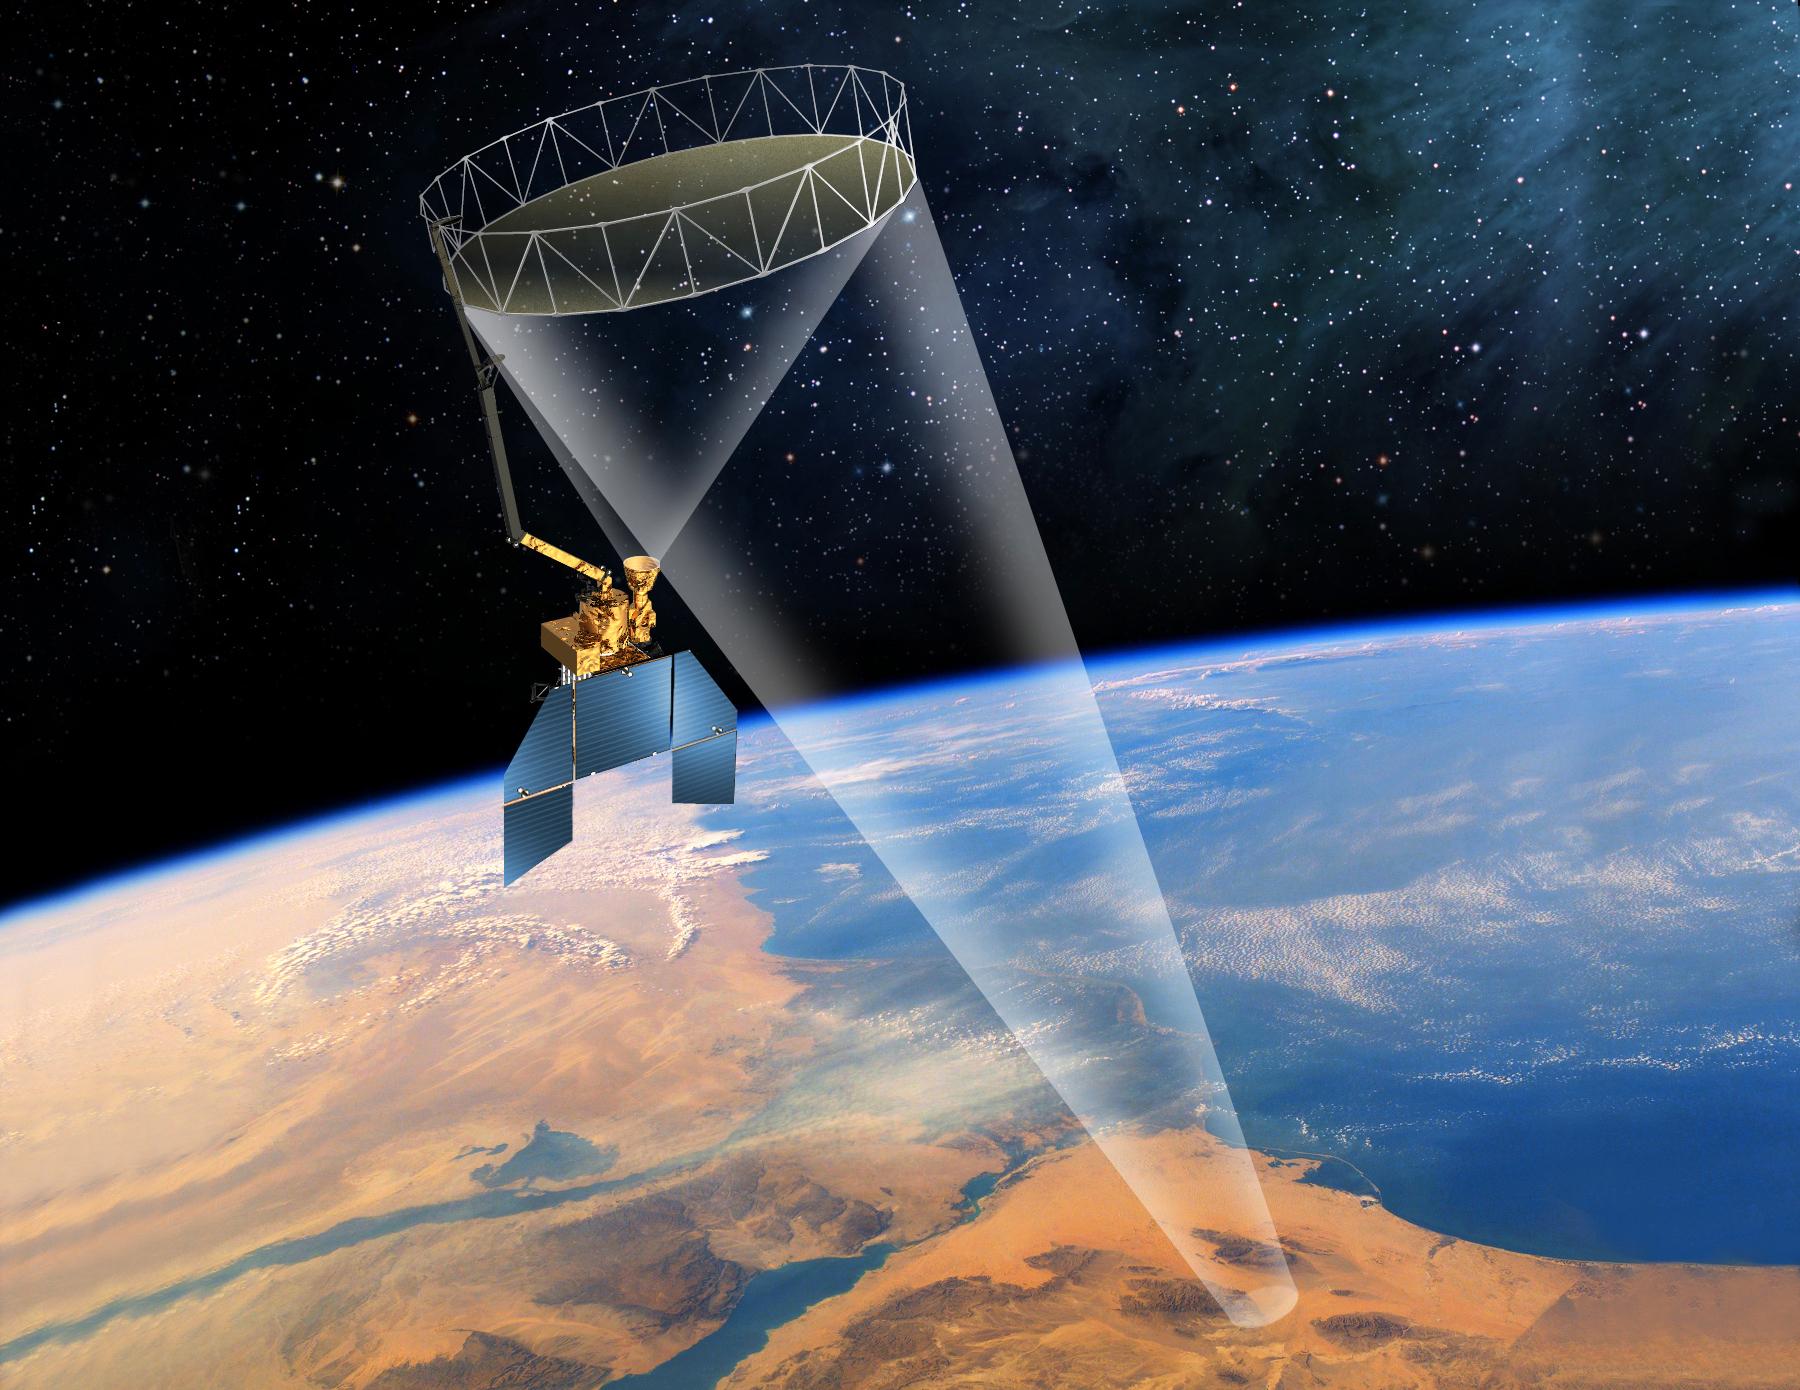 Artist's rendering of the SMAP satellite in orbit